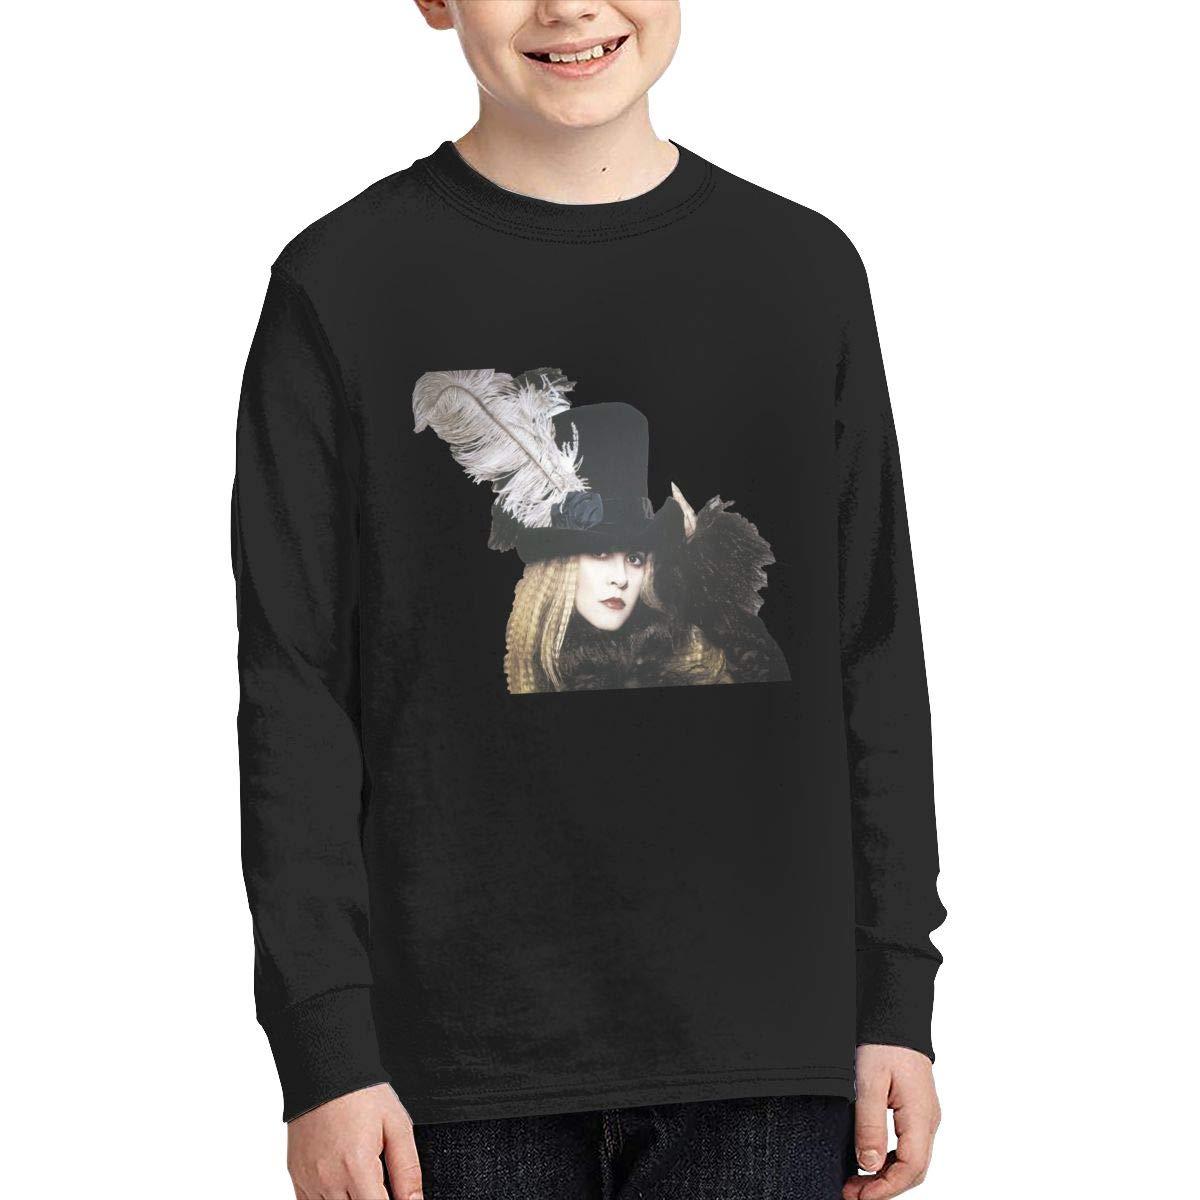 RhteGui Stevie Nicks Bella Donna Boys /& Girls Junior Vintage Long Sleeve T-Shirt Black